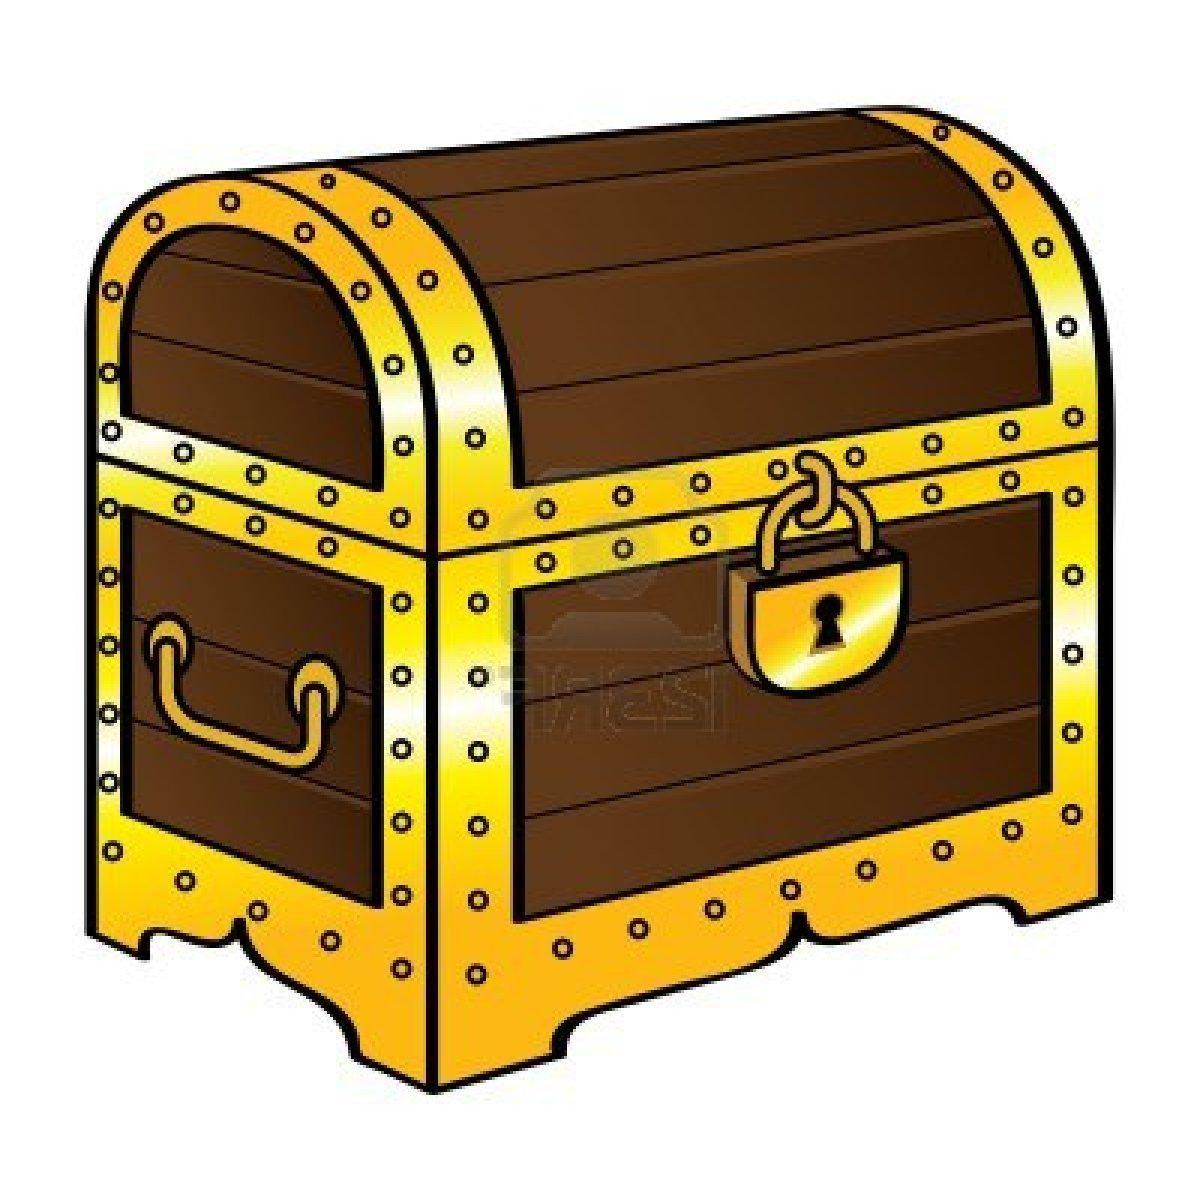 treasure box clipart at getdrawings com free for personal use rh getdrawings com treasure chest clipart images treasure chest clip art for free